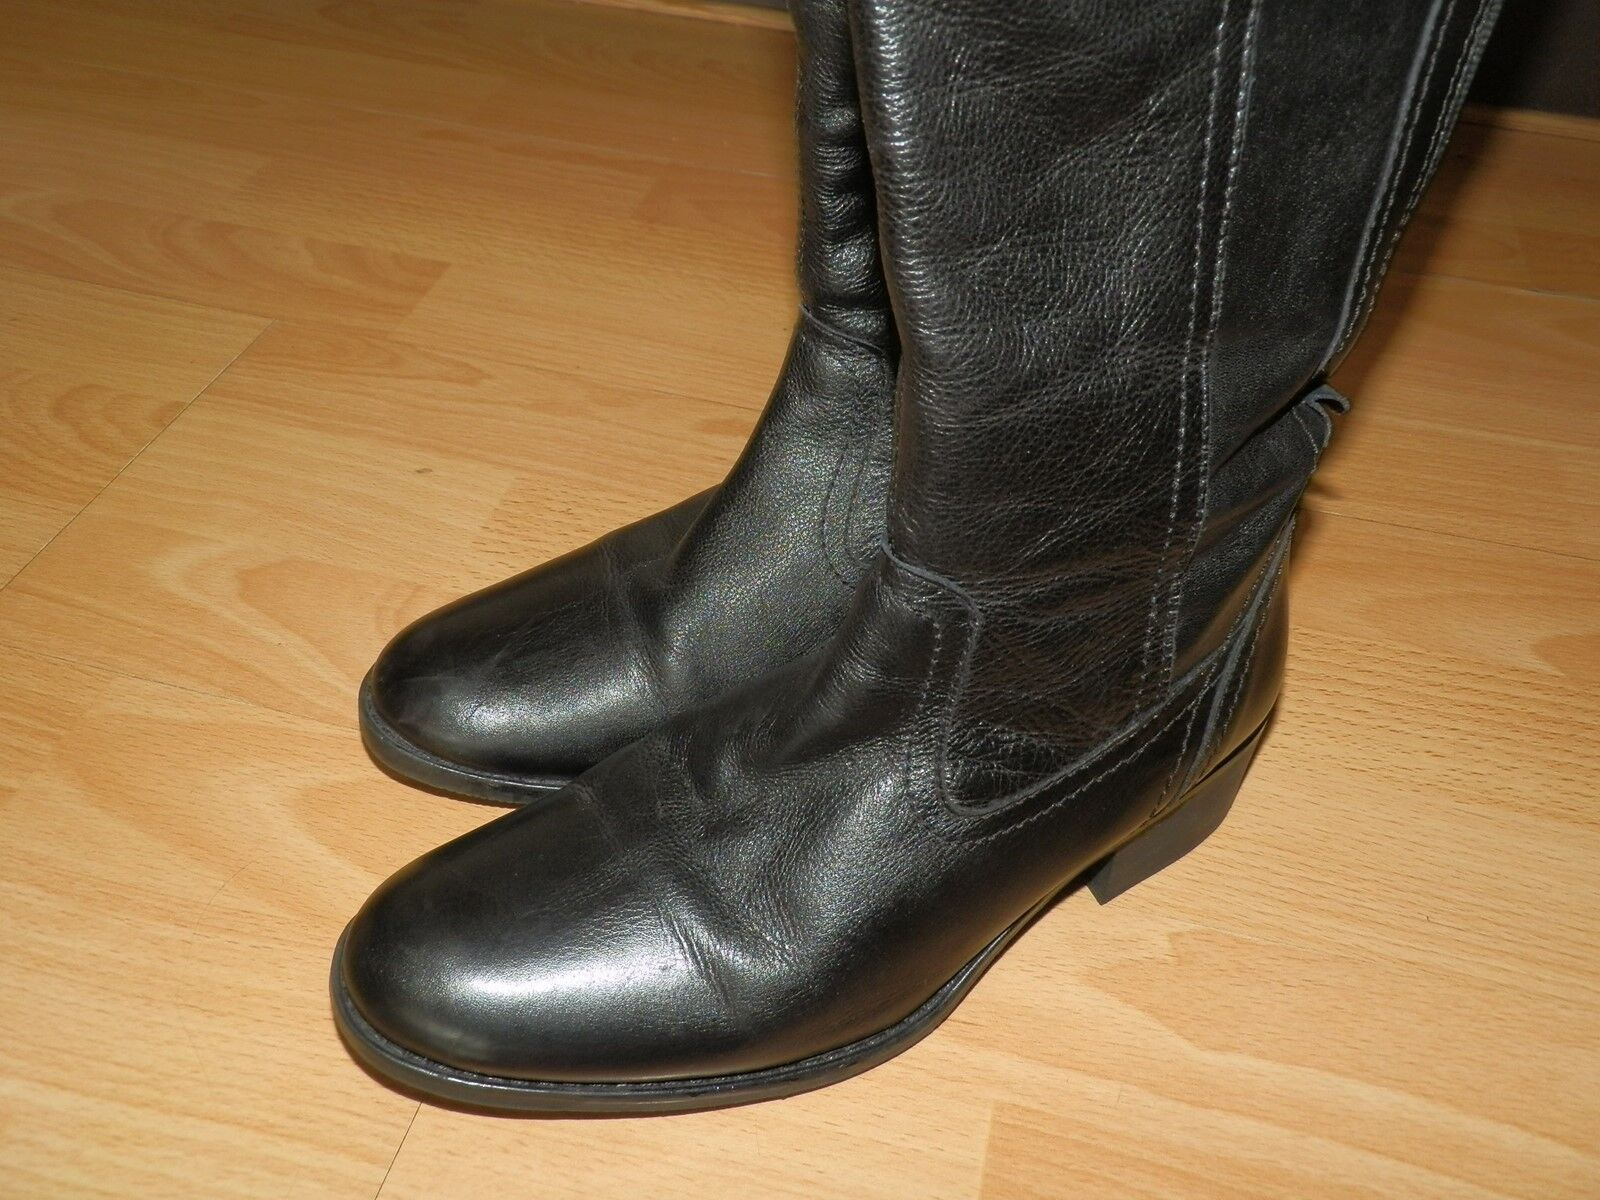 Støvler, str. 37, BON???A PARTE®